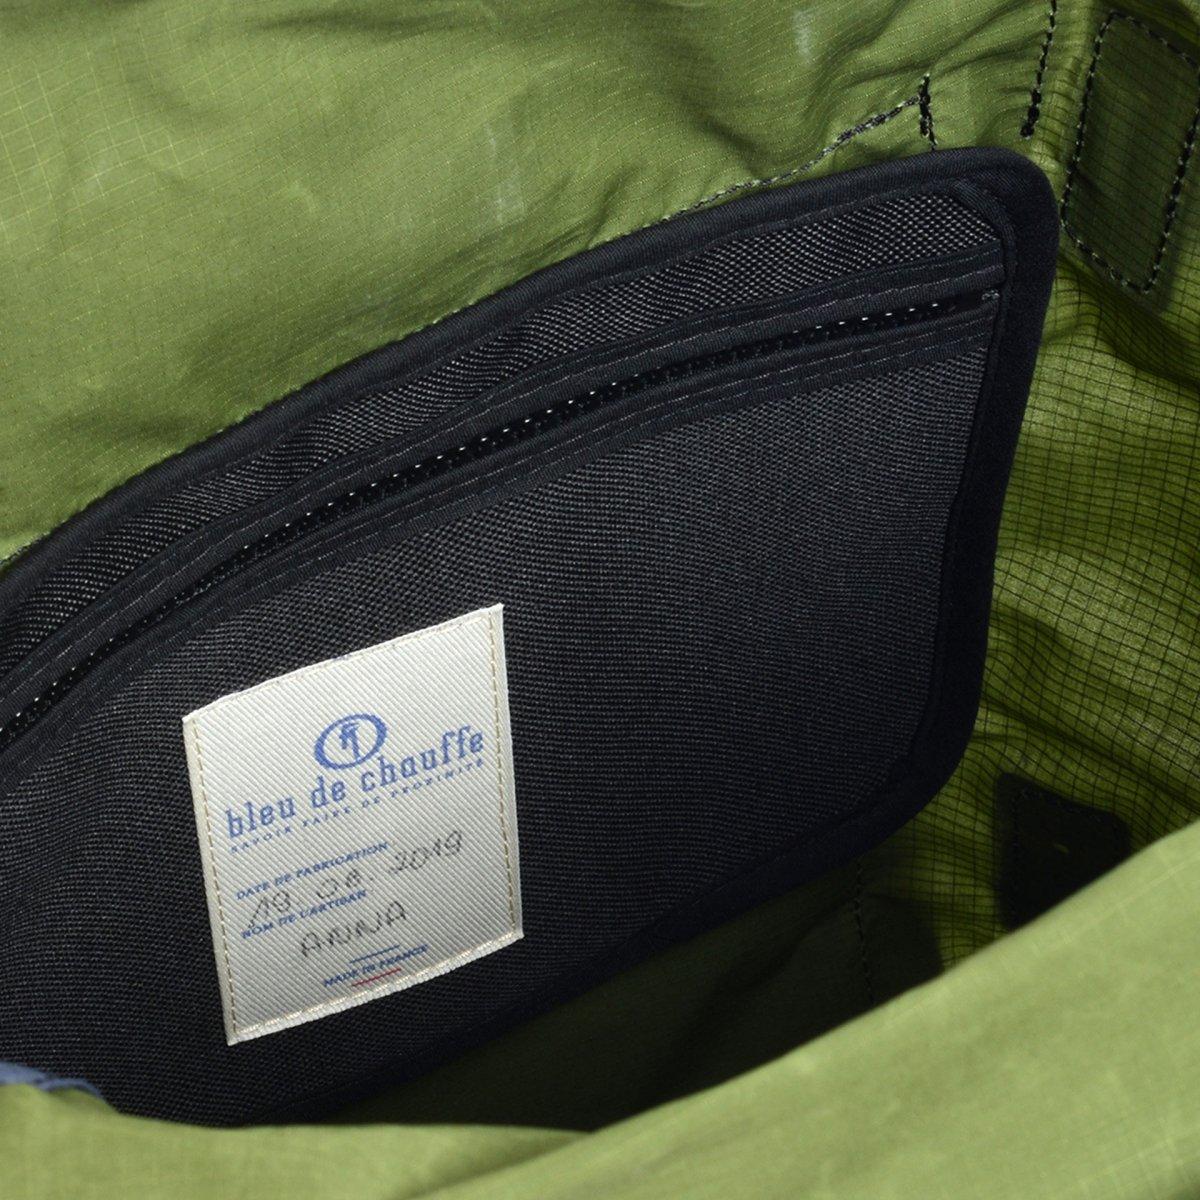 20L Basile Backpack - Bancha Green (image n°4)